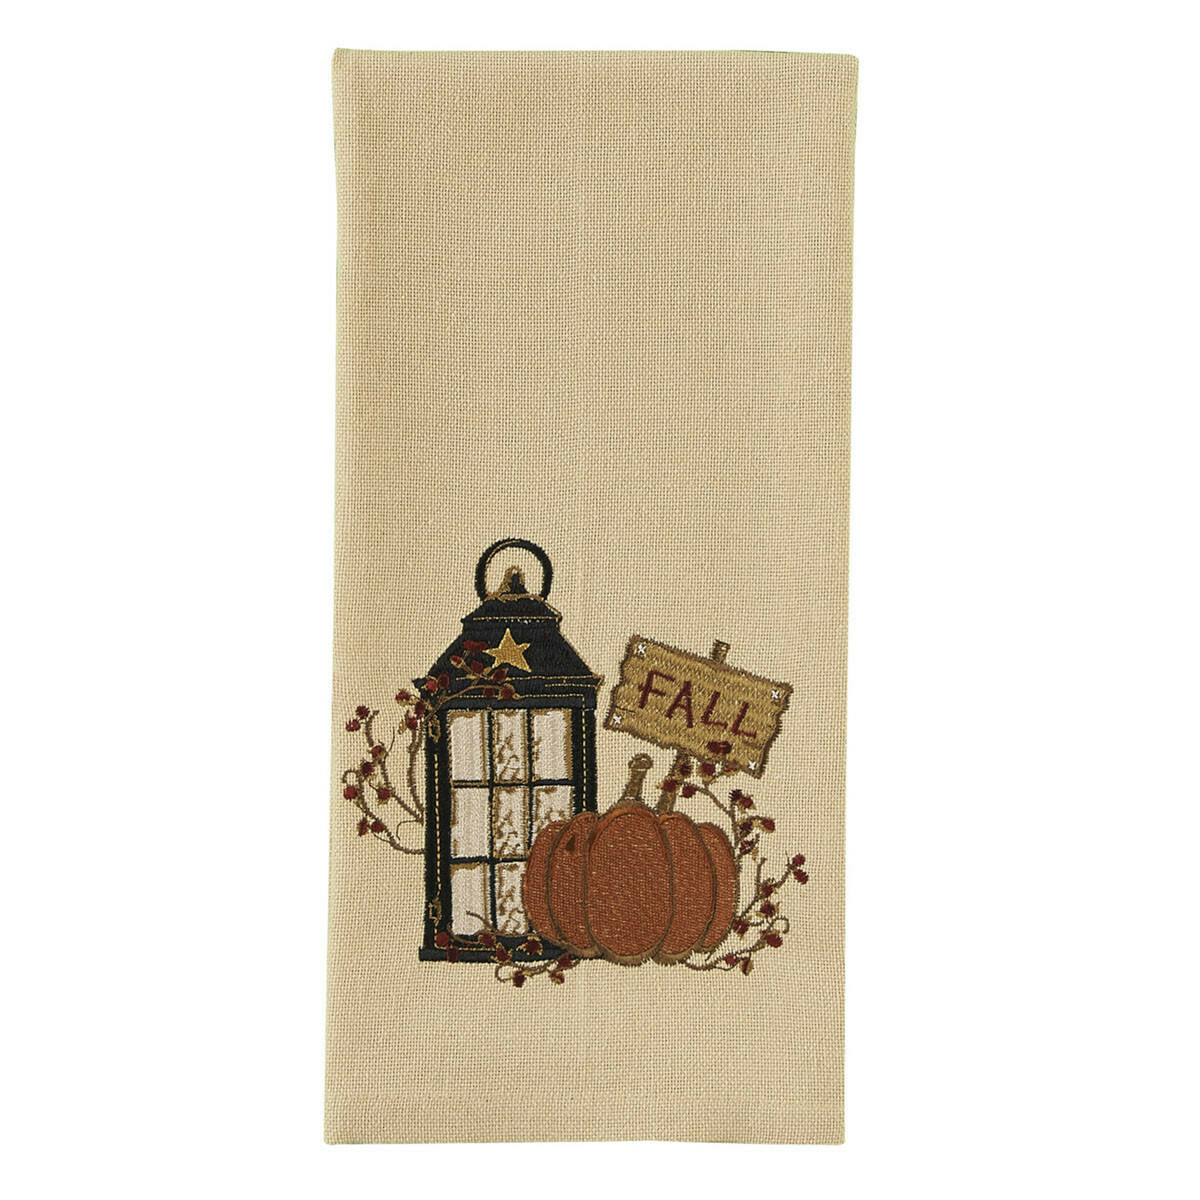 Lantern & Pumpkin Embroidered Dishtowel